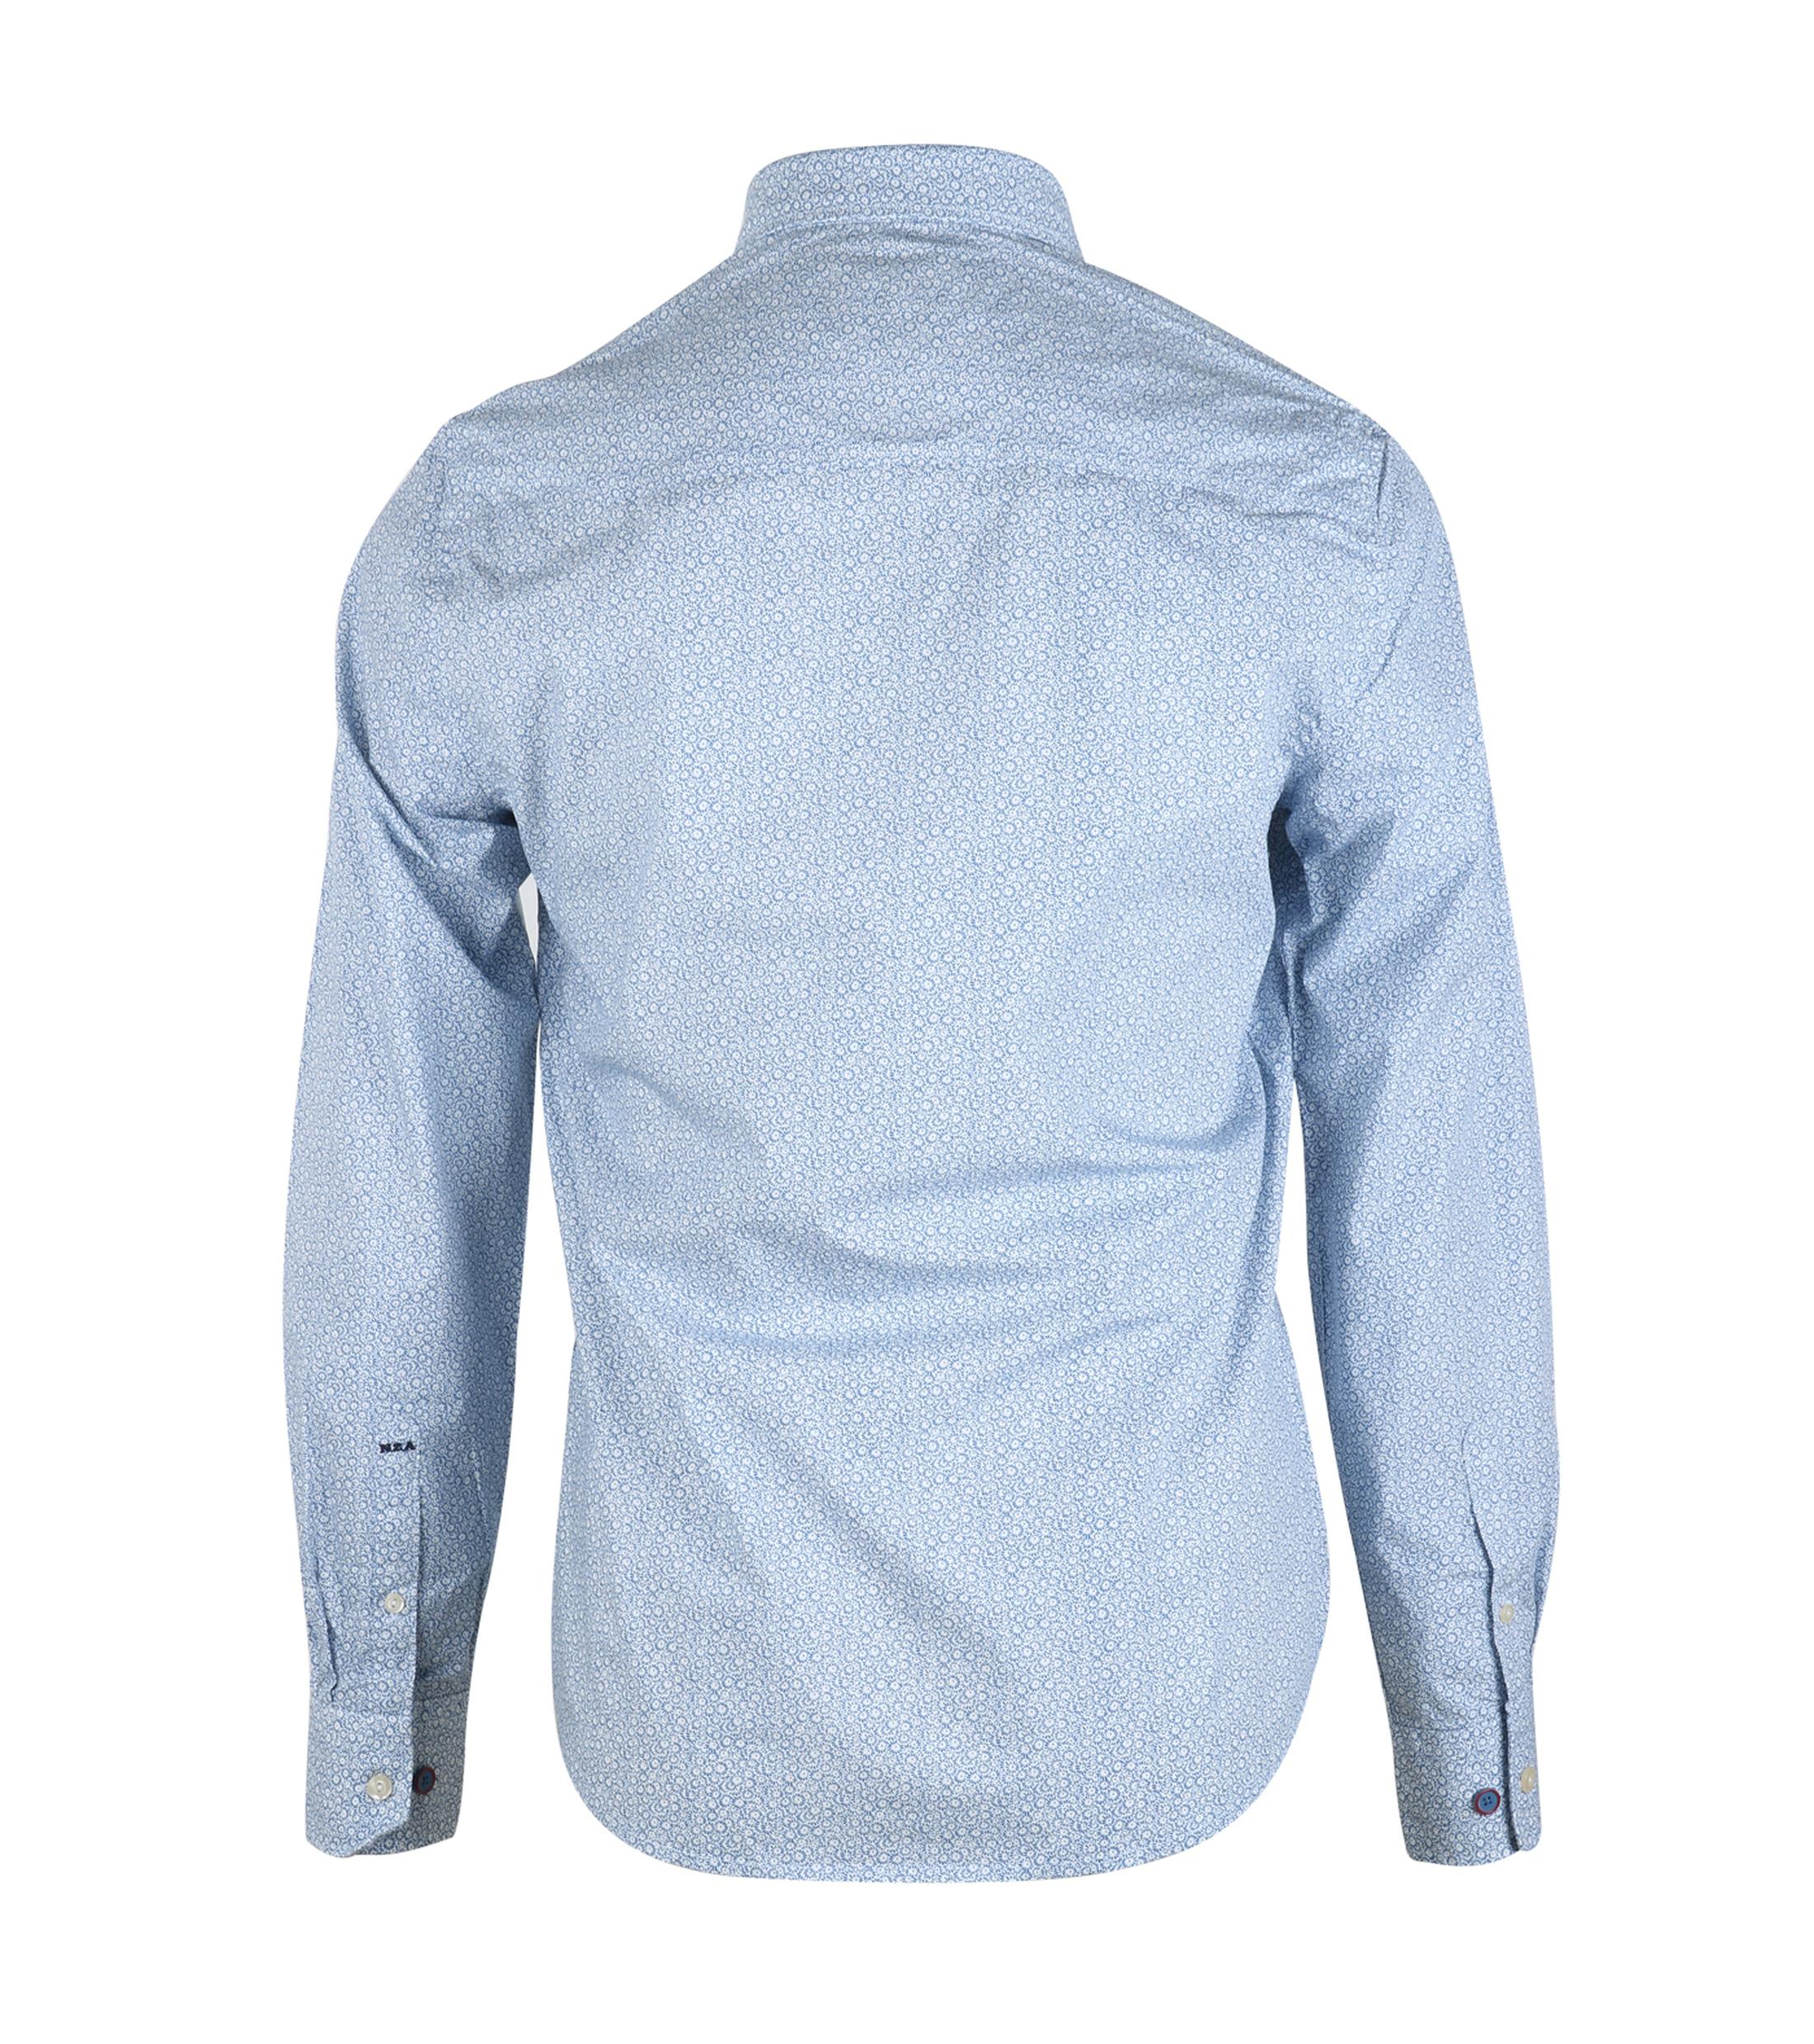 NZA Overhemd Blauw 16MN506 foto 1